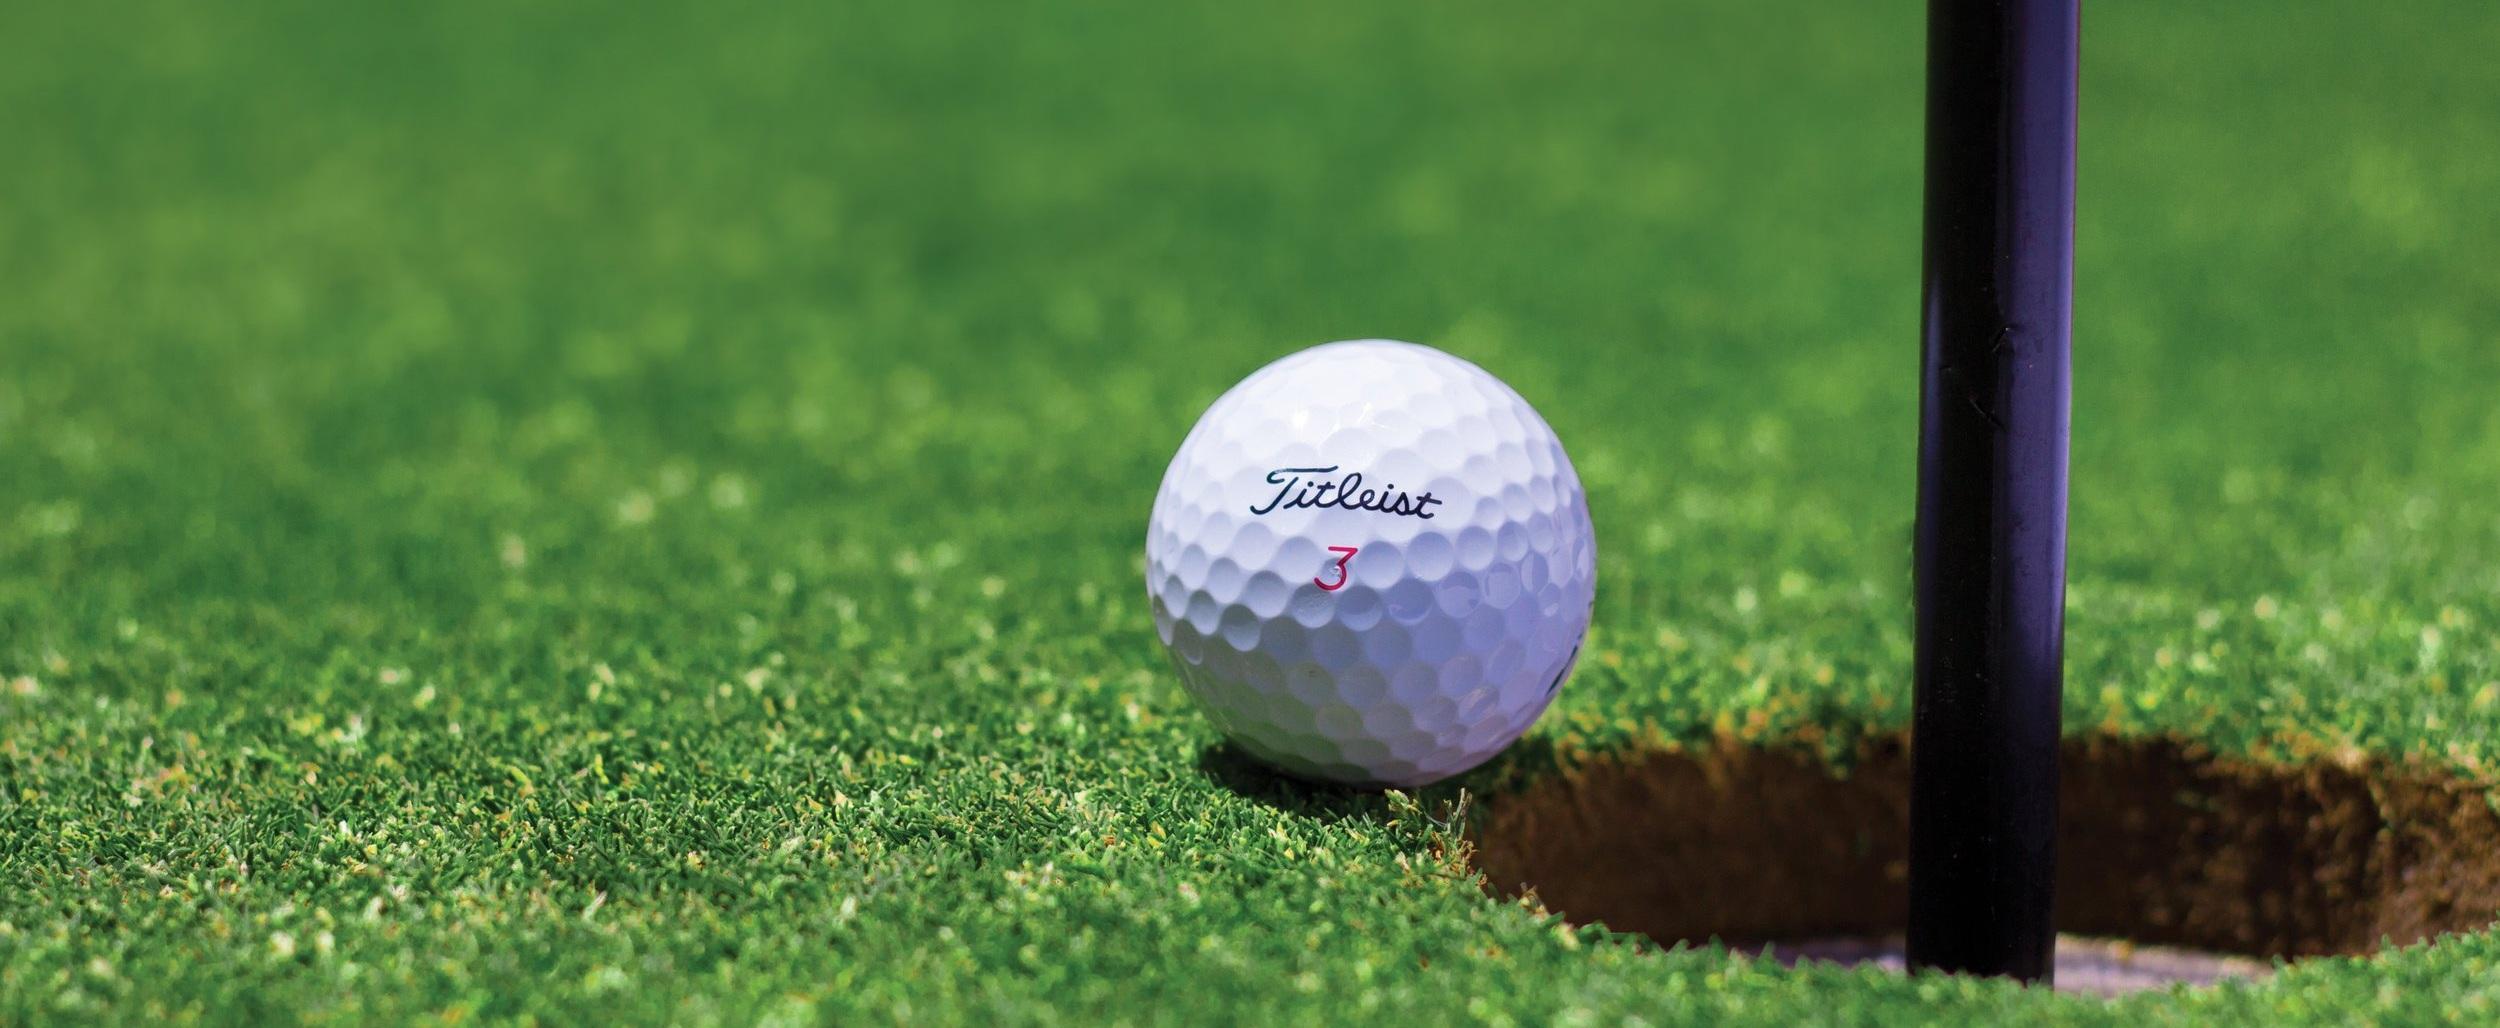 golf-1284012.jpg